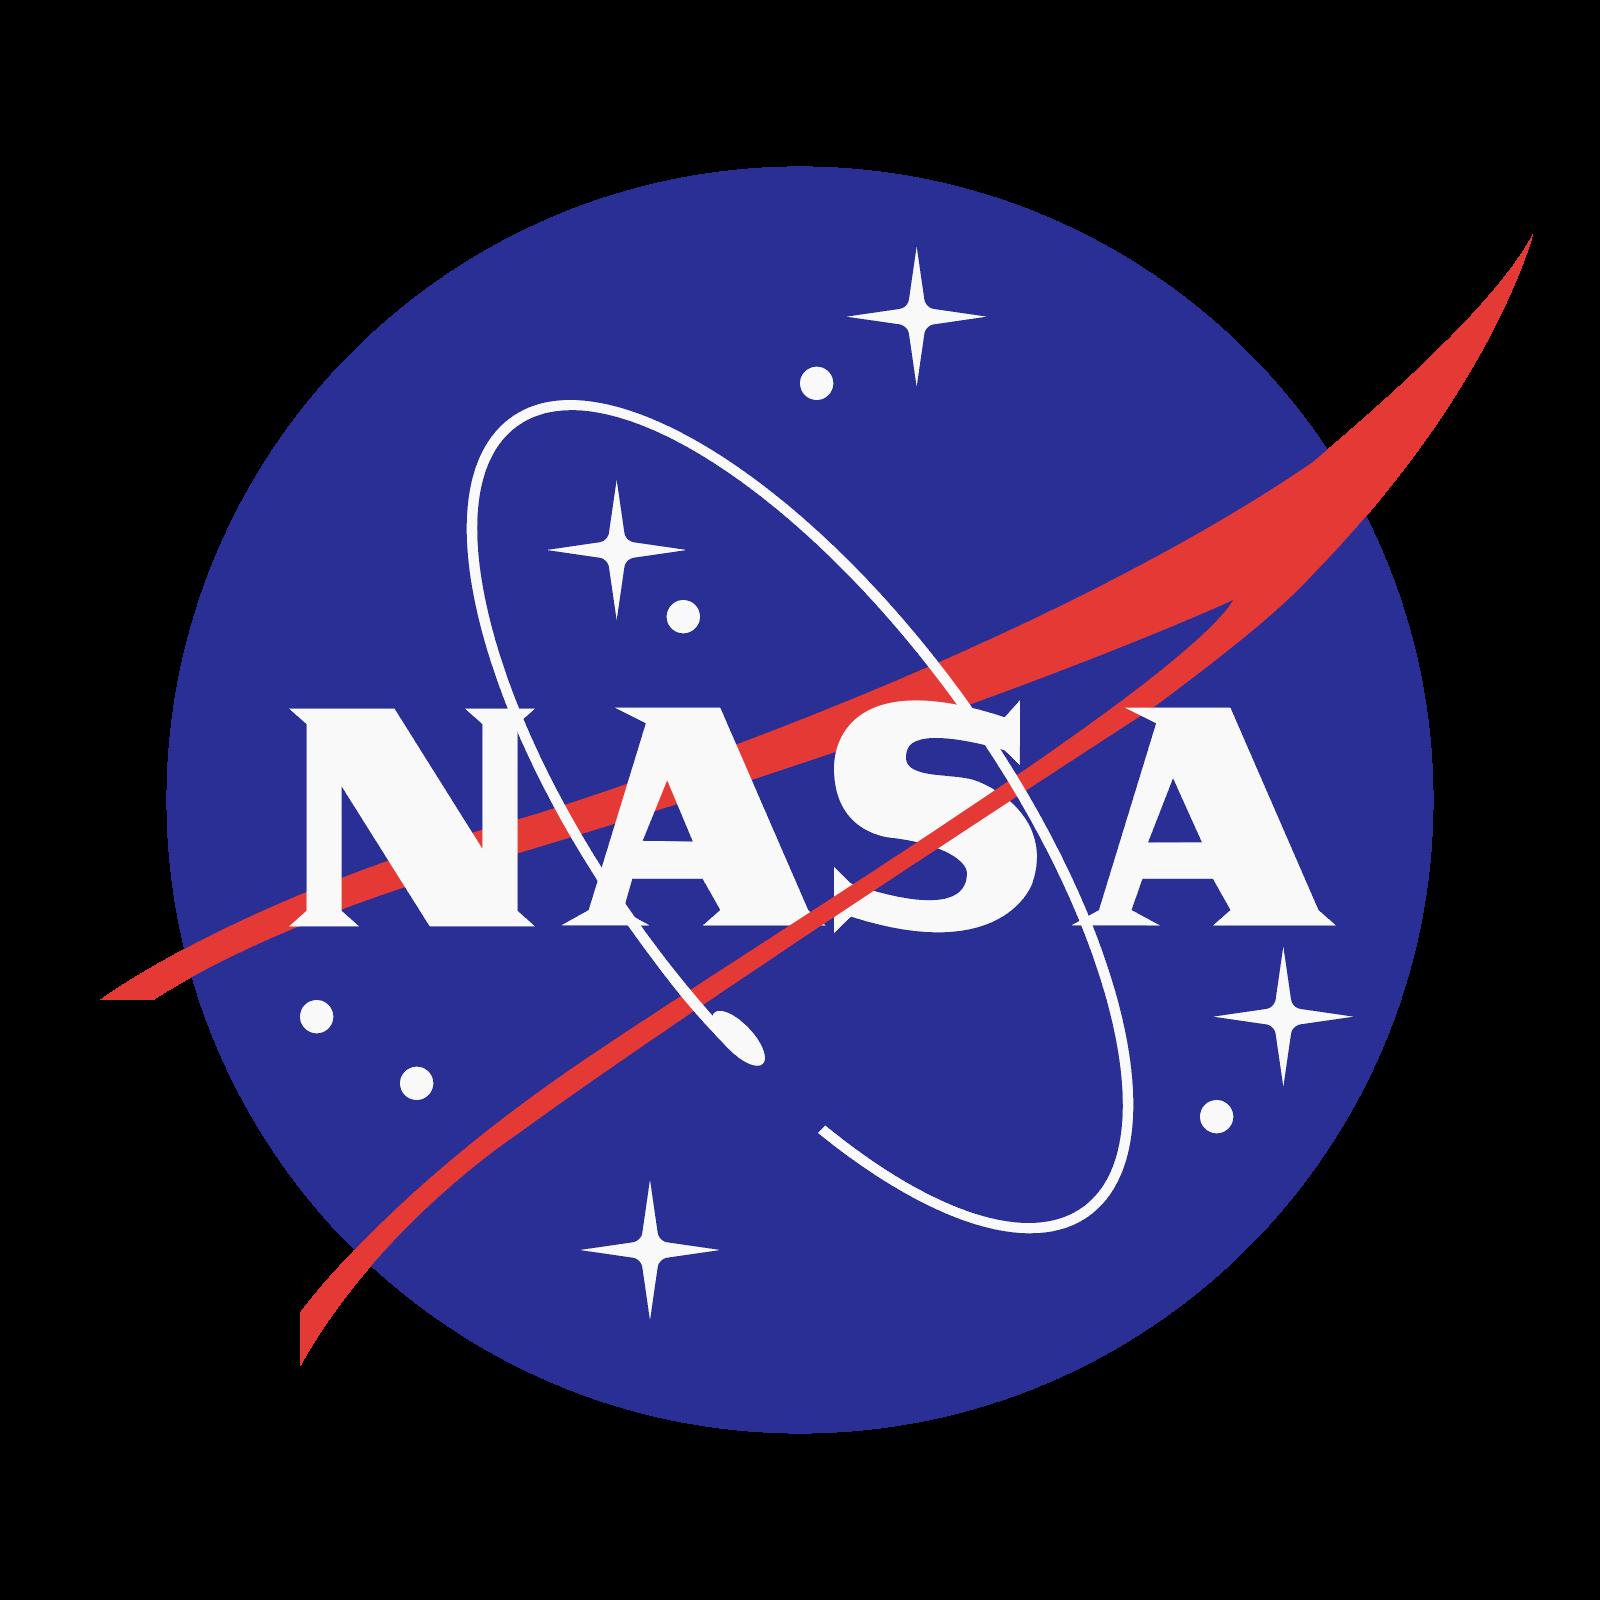 Nasa icon Nasa, Icon, Png